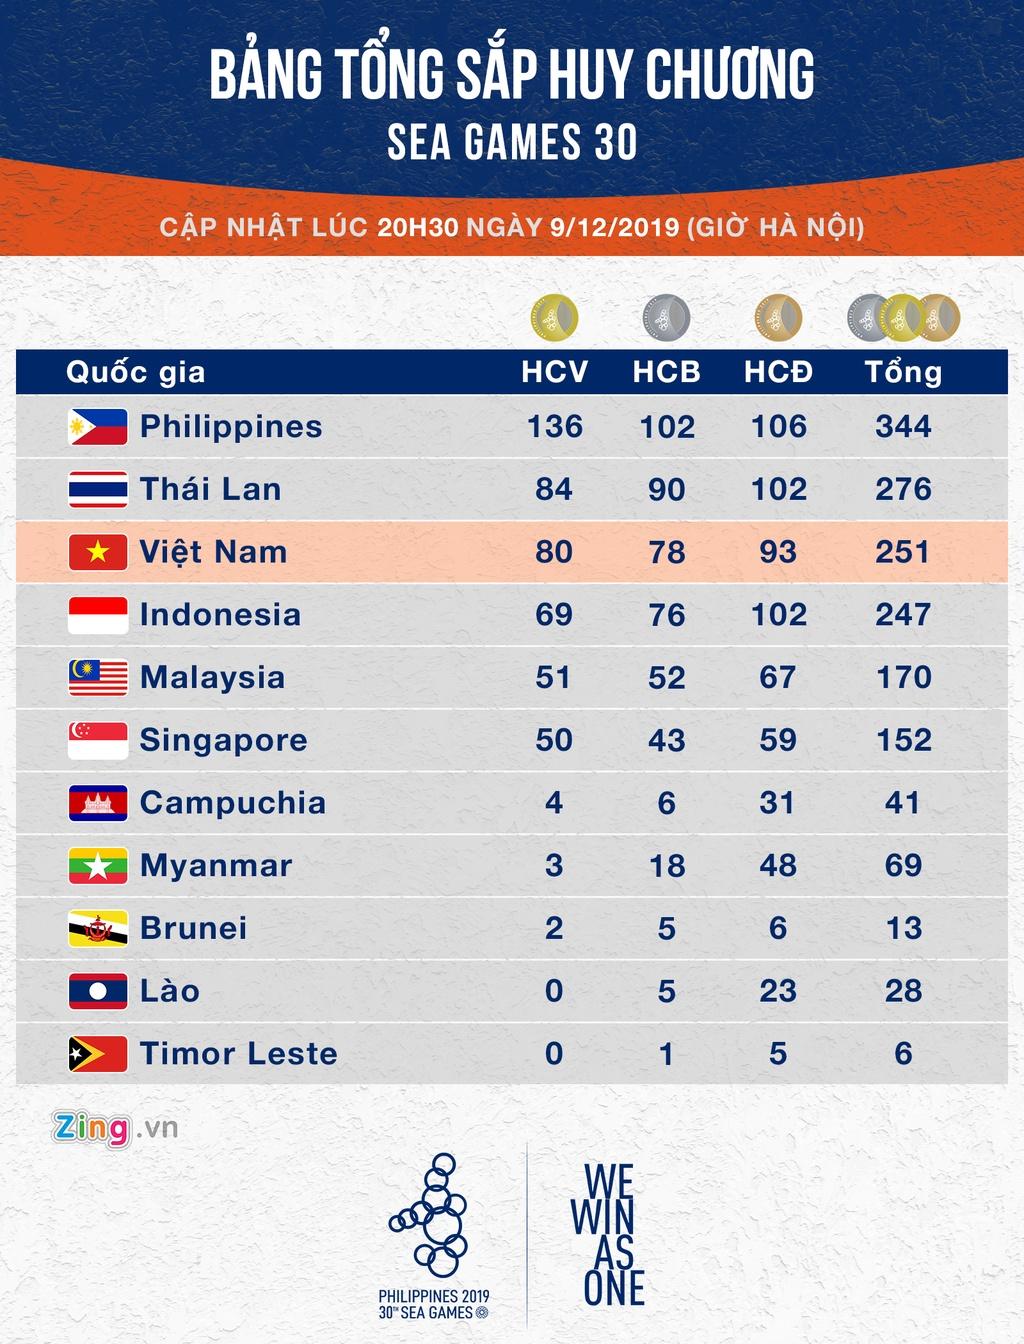 Bang tong sap huy chuong SEA Games 30: Thai Lan vuot qua Viet Nam hinh anh 1